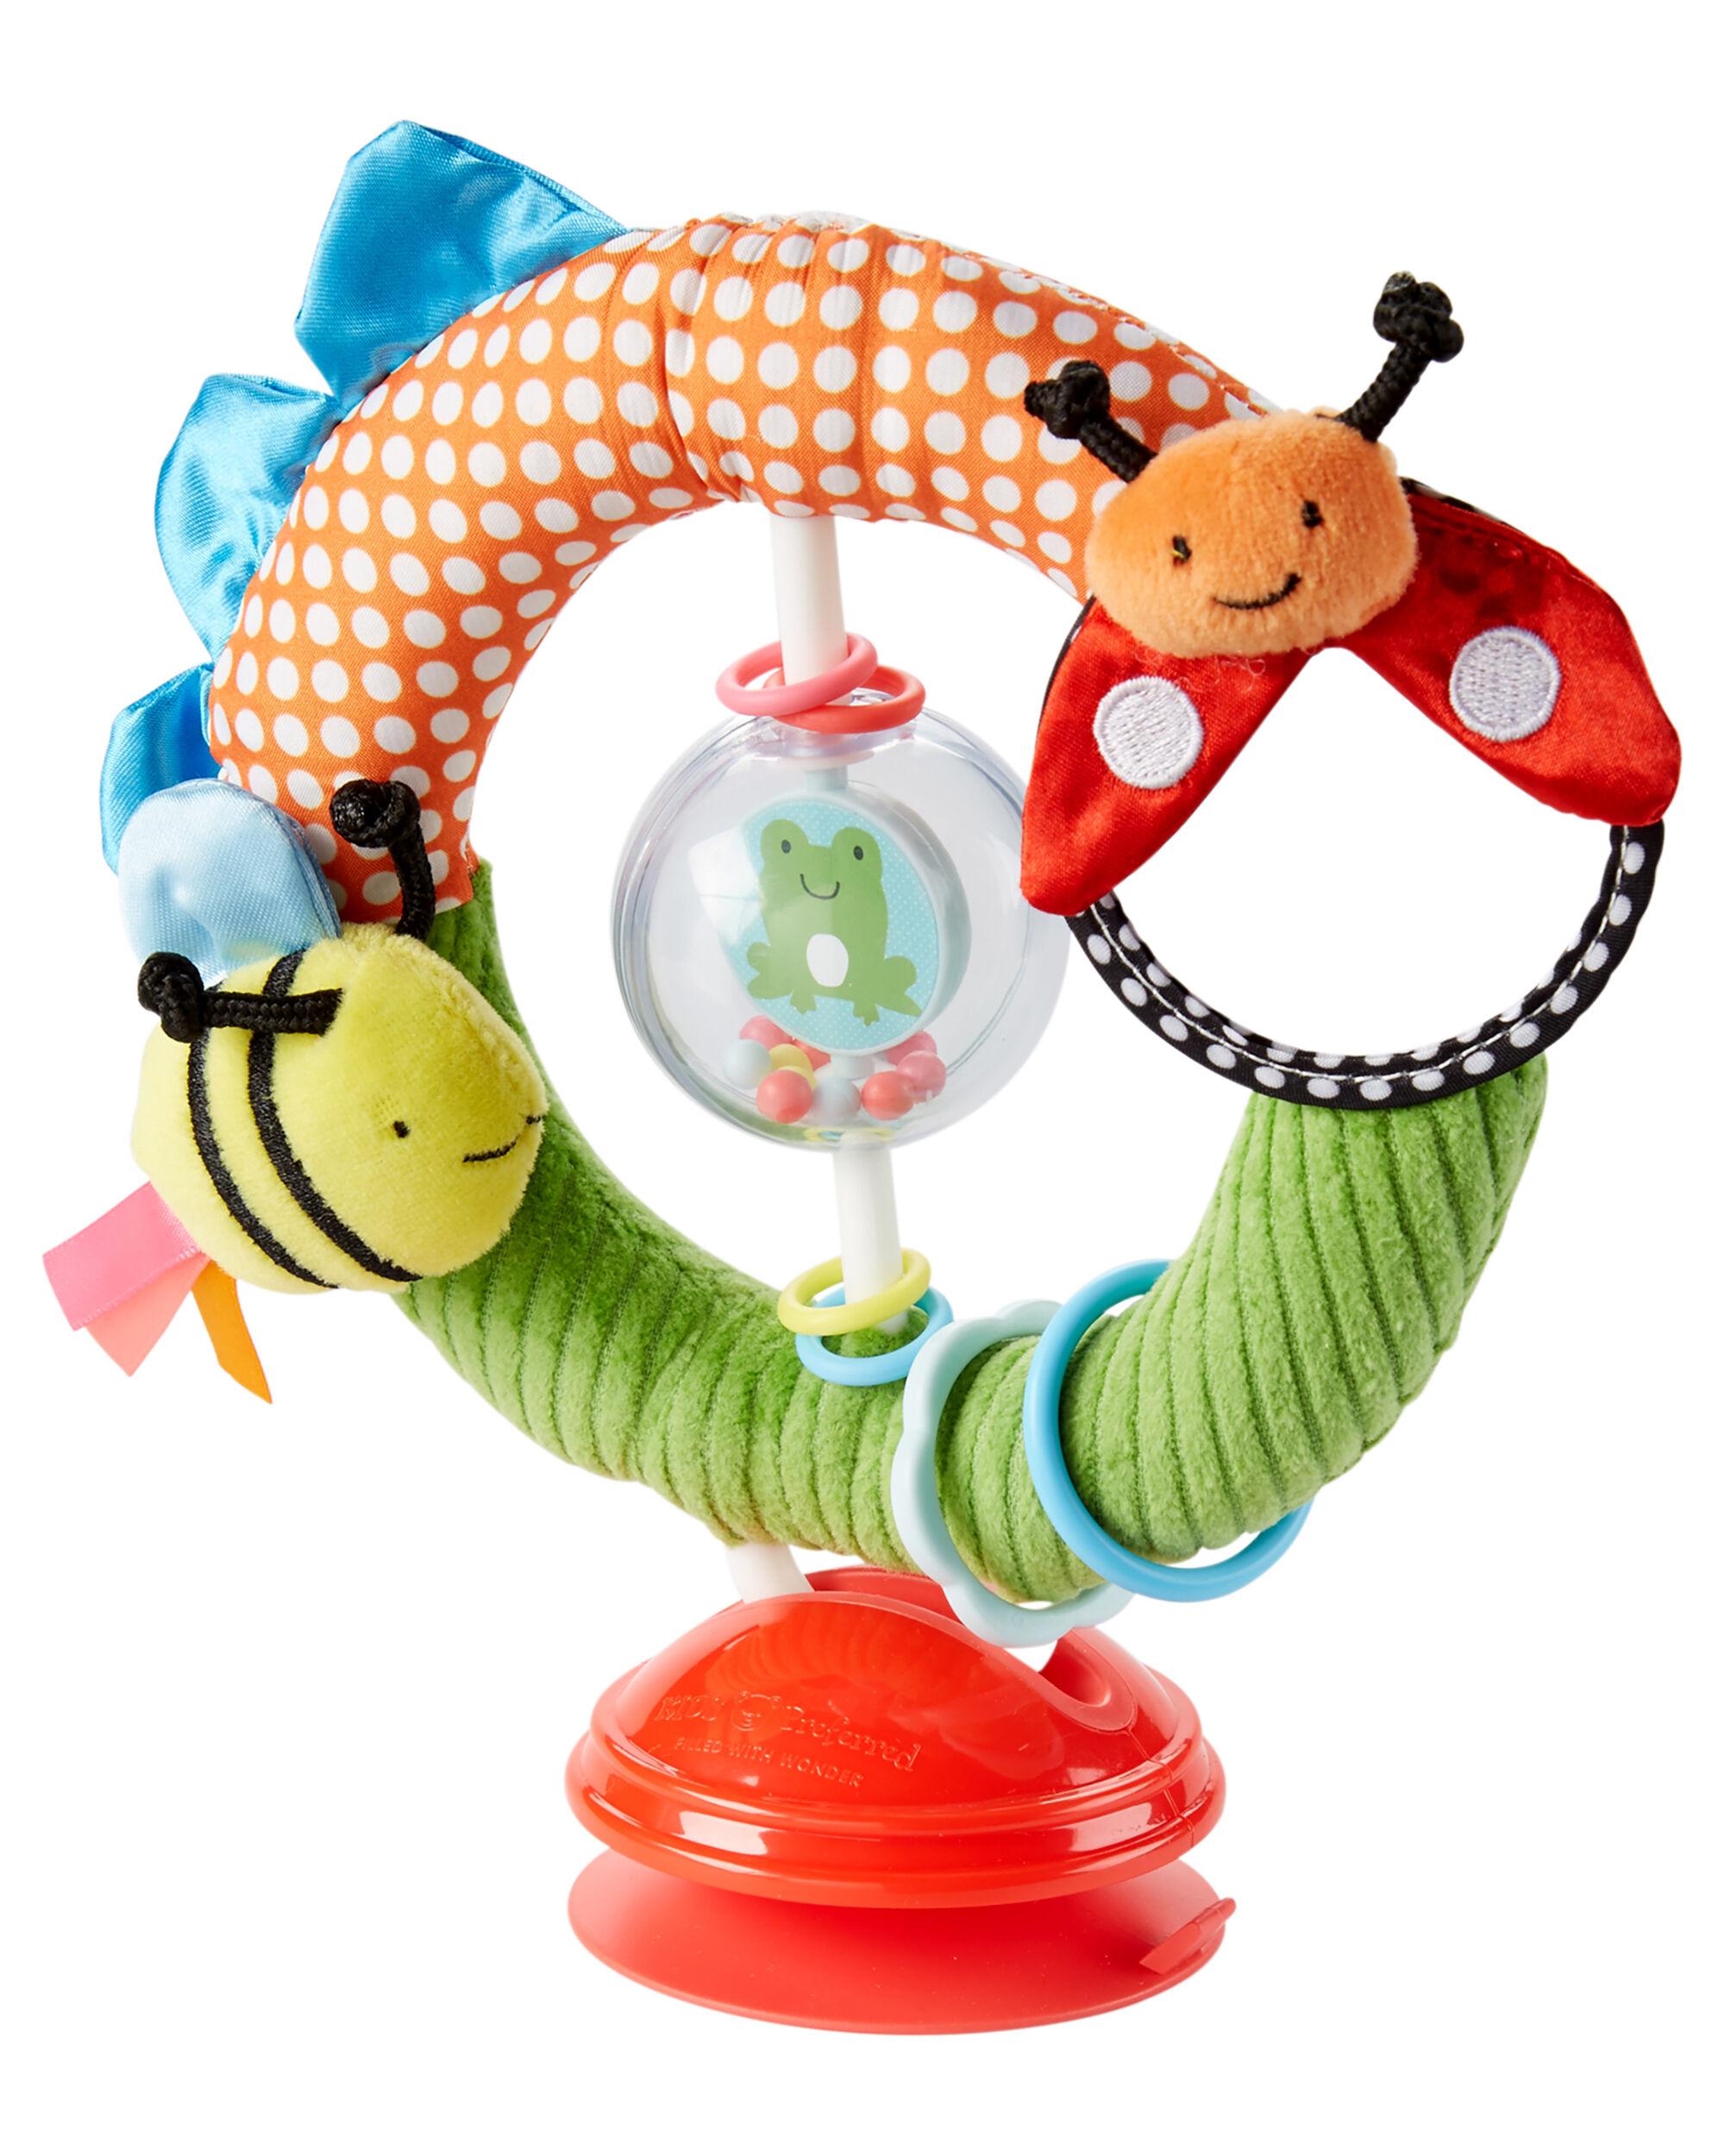 Bumble Wheel Activity Toy